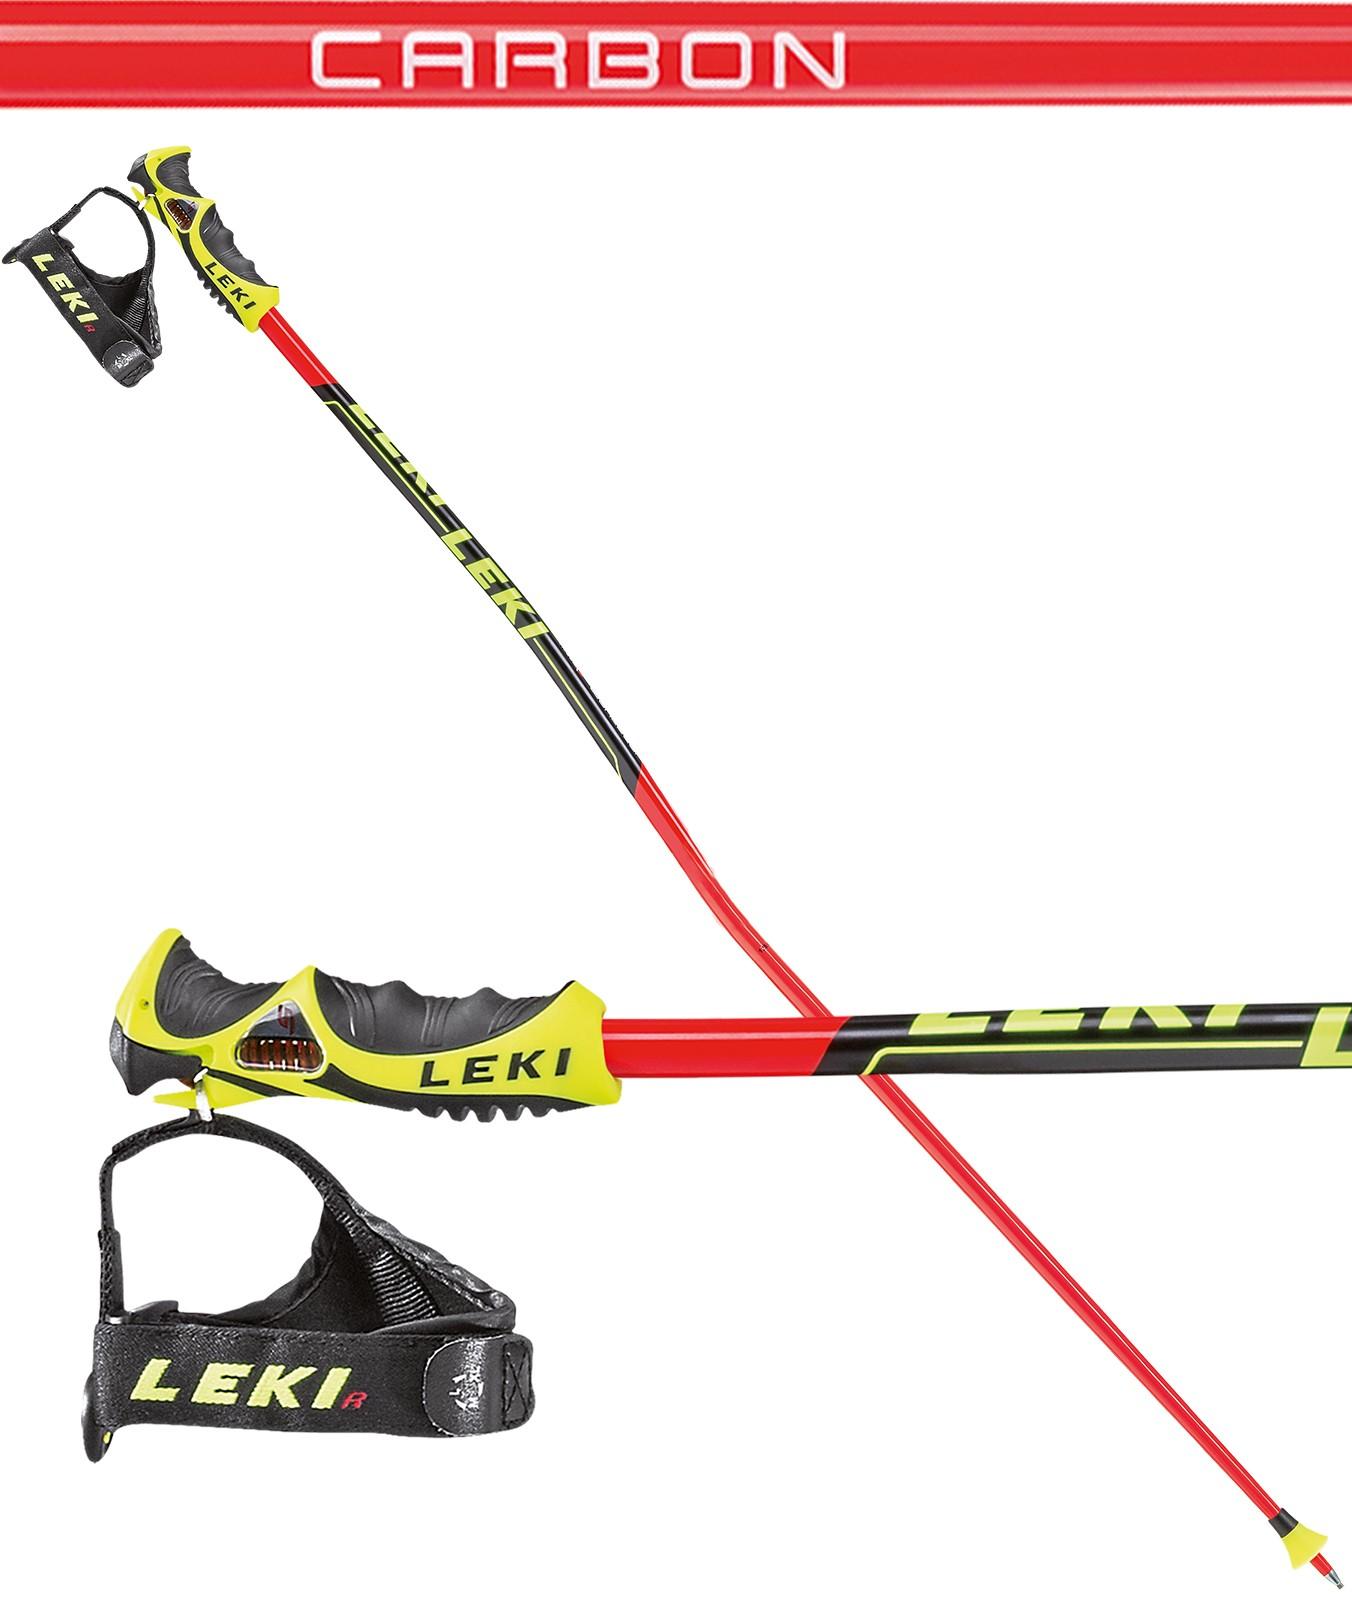 Leki Carbon GS TR-S ski poles, 2018